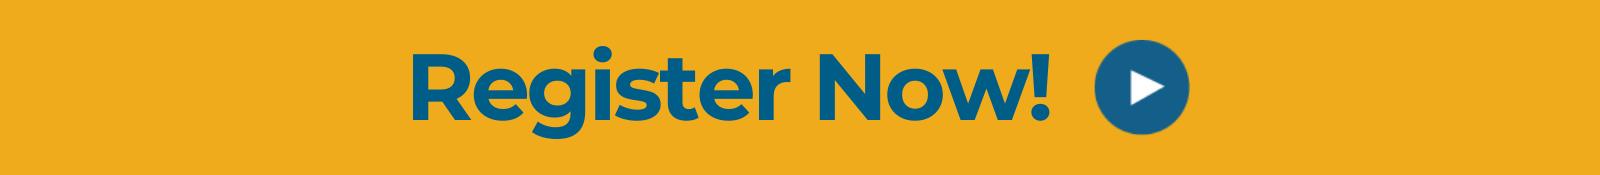 Register Now - Virtual Model United Nations Institute